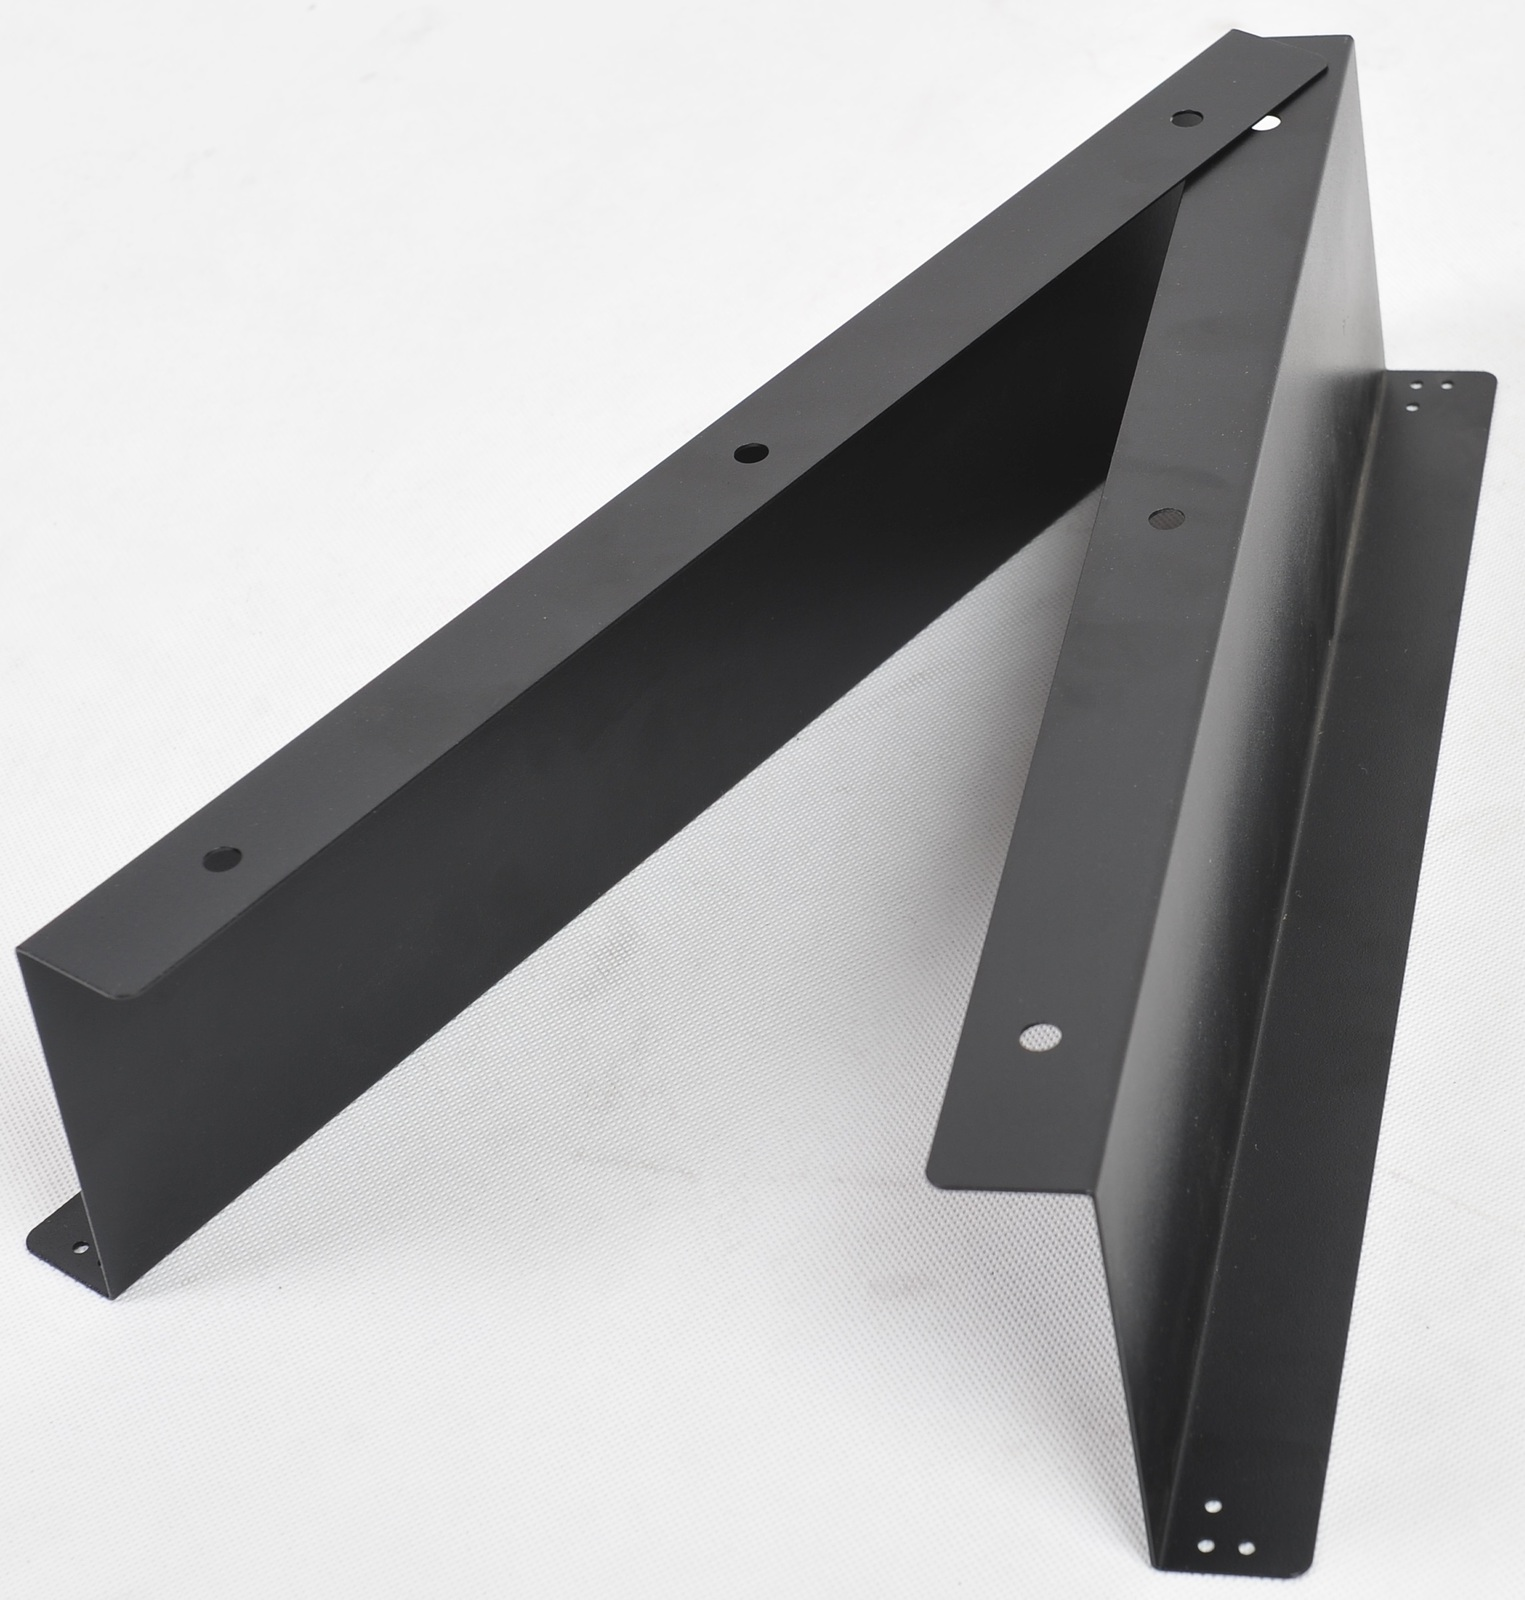 Capture Under Counter Mounting Bracket For Cash Drawer CA-CD410-480 CA-CD-MOUNT - eet01